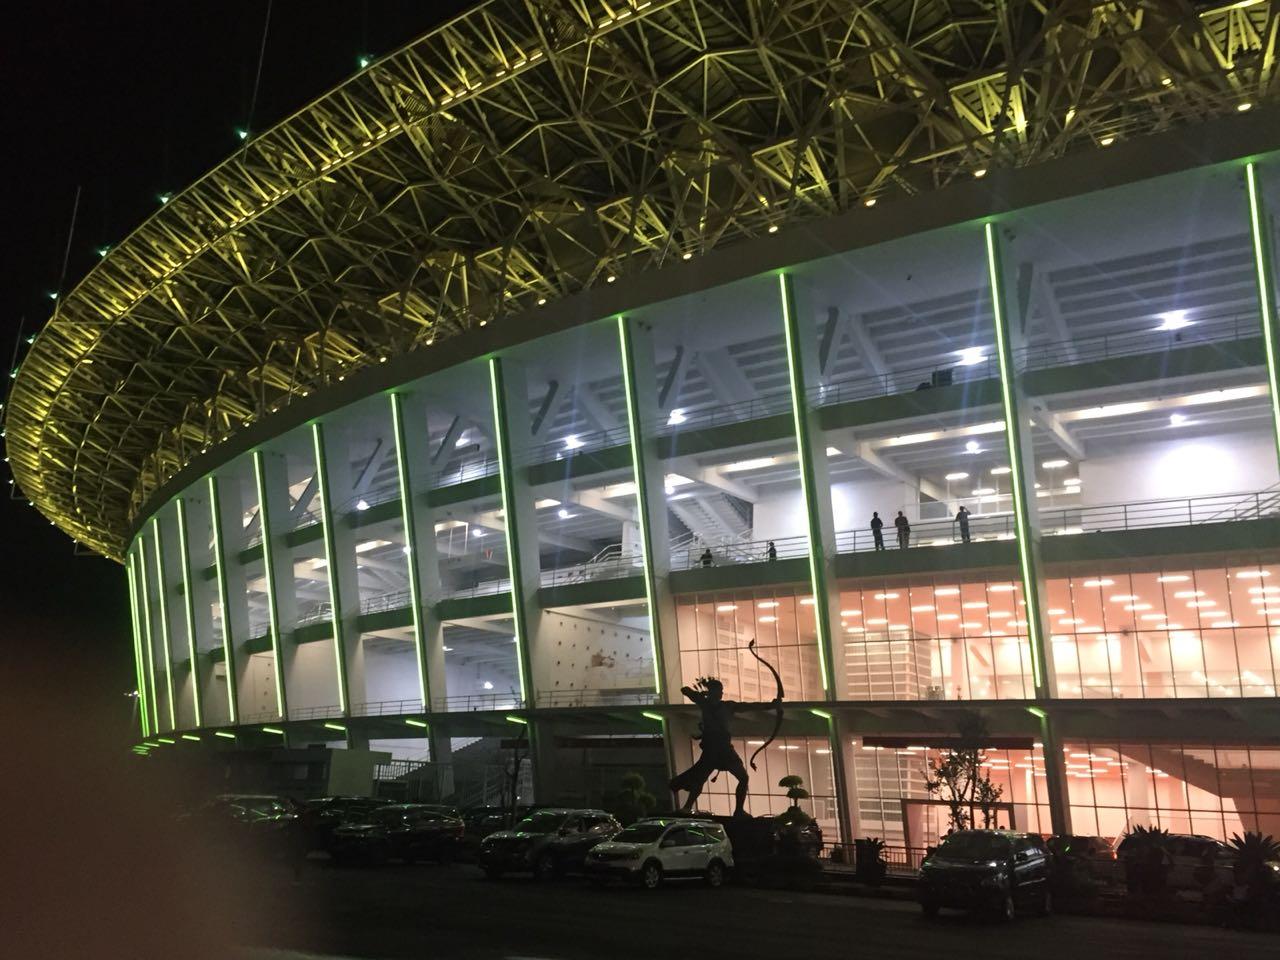 https: img-o.okeinfo.net content 2018 01 12 470 1844348 stadion-gelora-bung-karno-direnovasi-warga-jakarta-harus-merawatnya-fOEbwS4NML.jpg